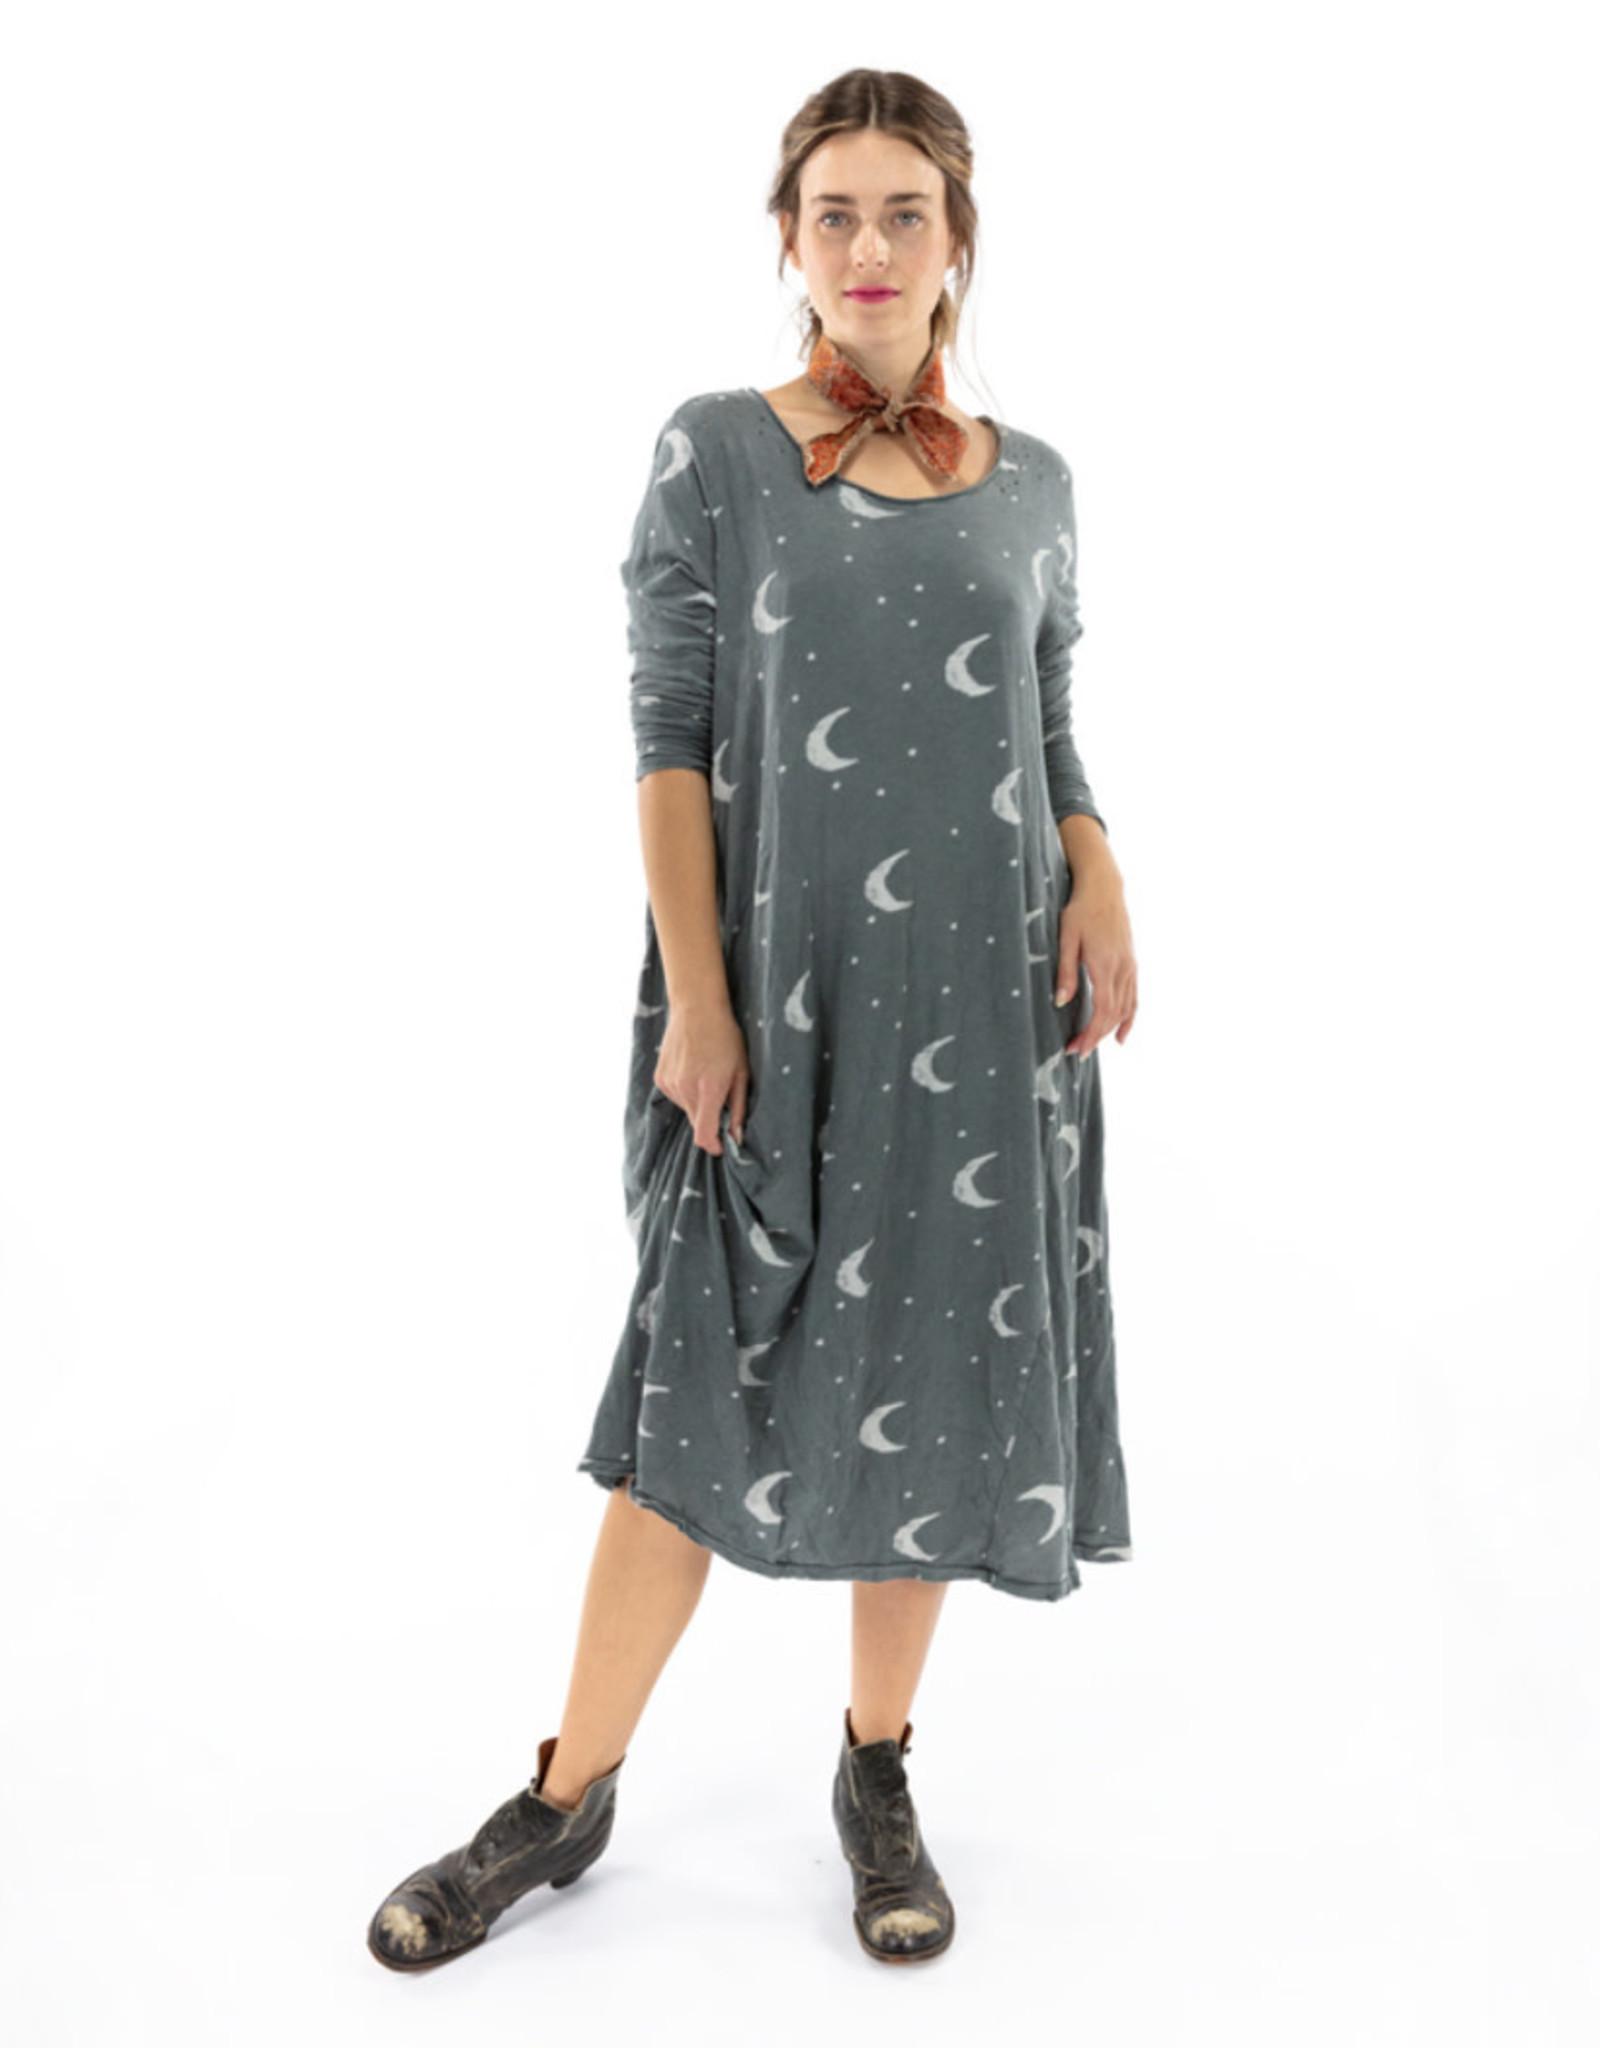 Magnolia Pearl Dress 705 (Ozzy, O/S)